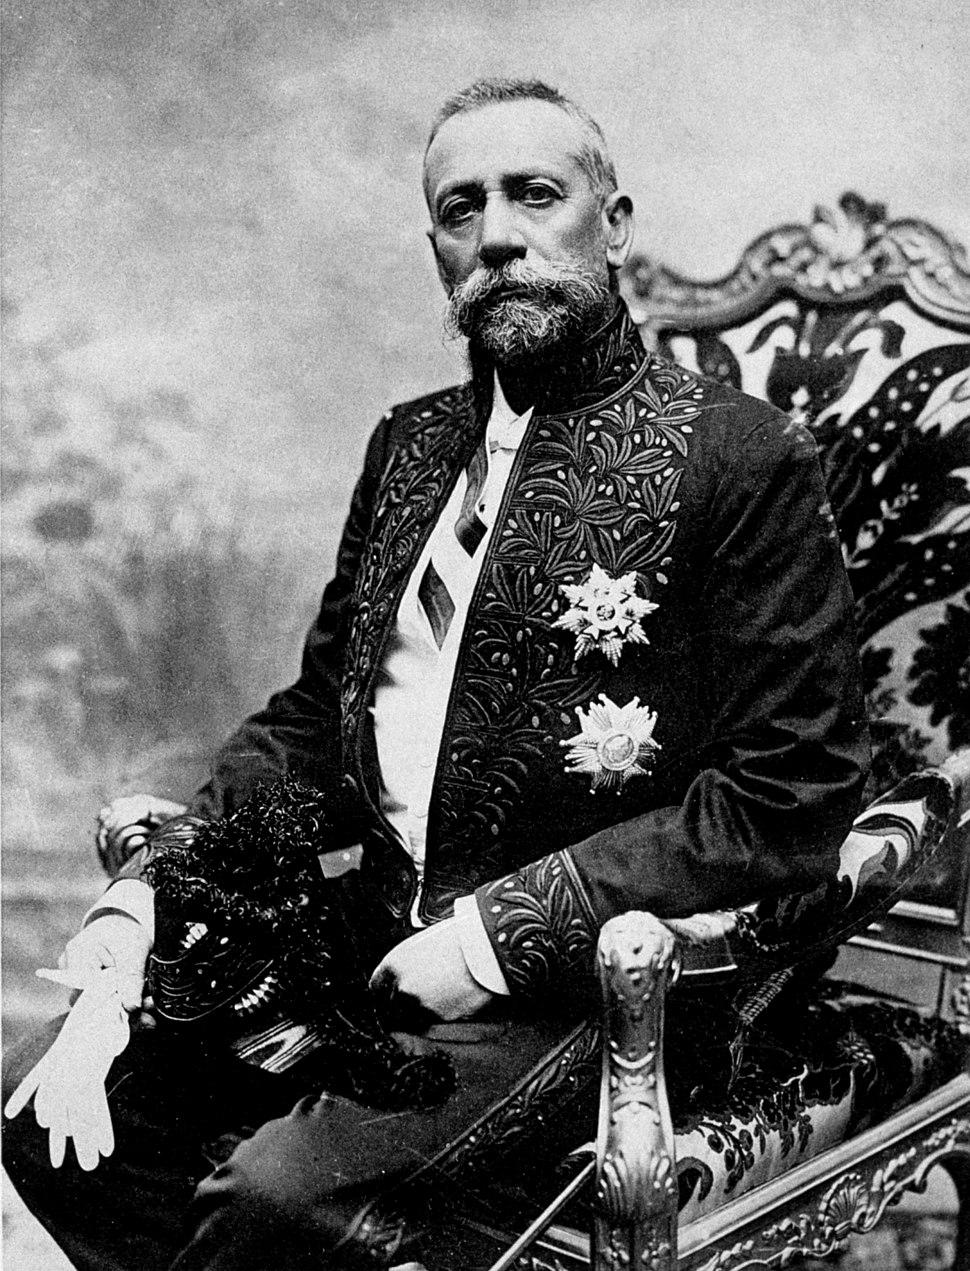 Prince Albert I of Monaco - circa 1910